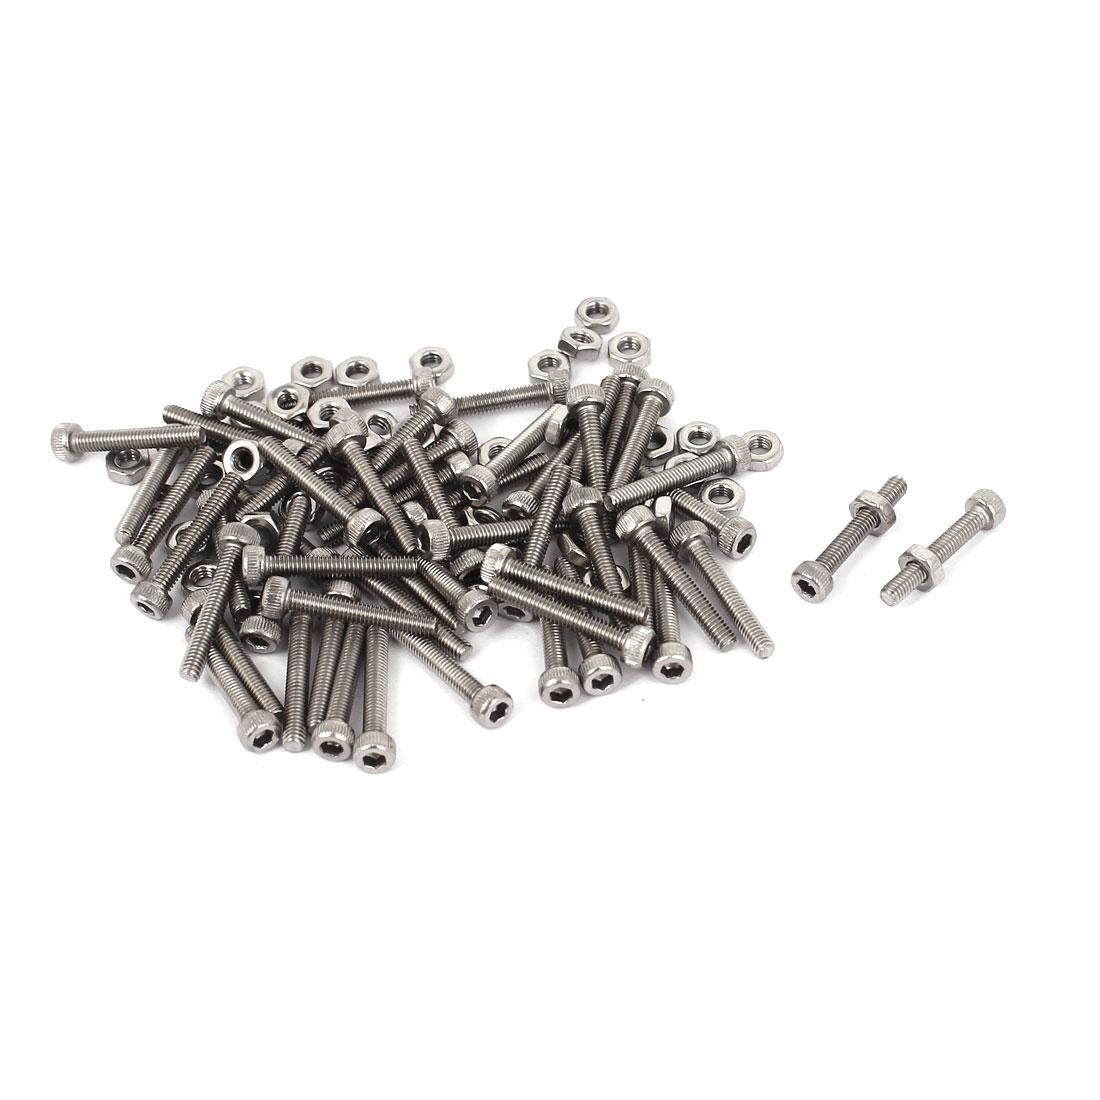 M2.5x16mm Stainless Steel Hex Socket Head Knurled Cap Screws Bolts Nut Set 50Pcs